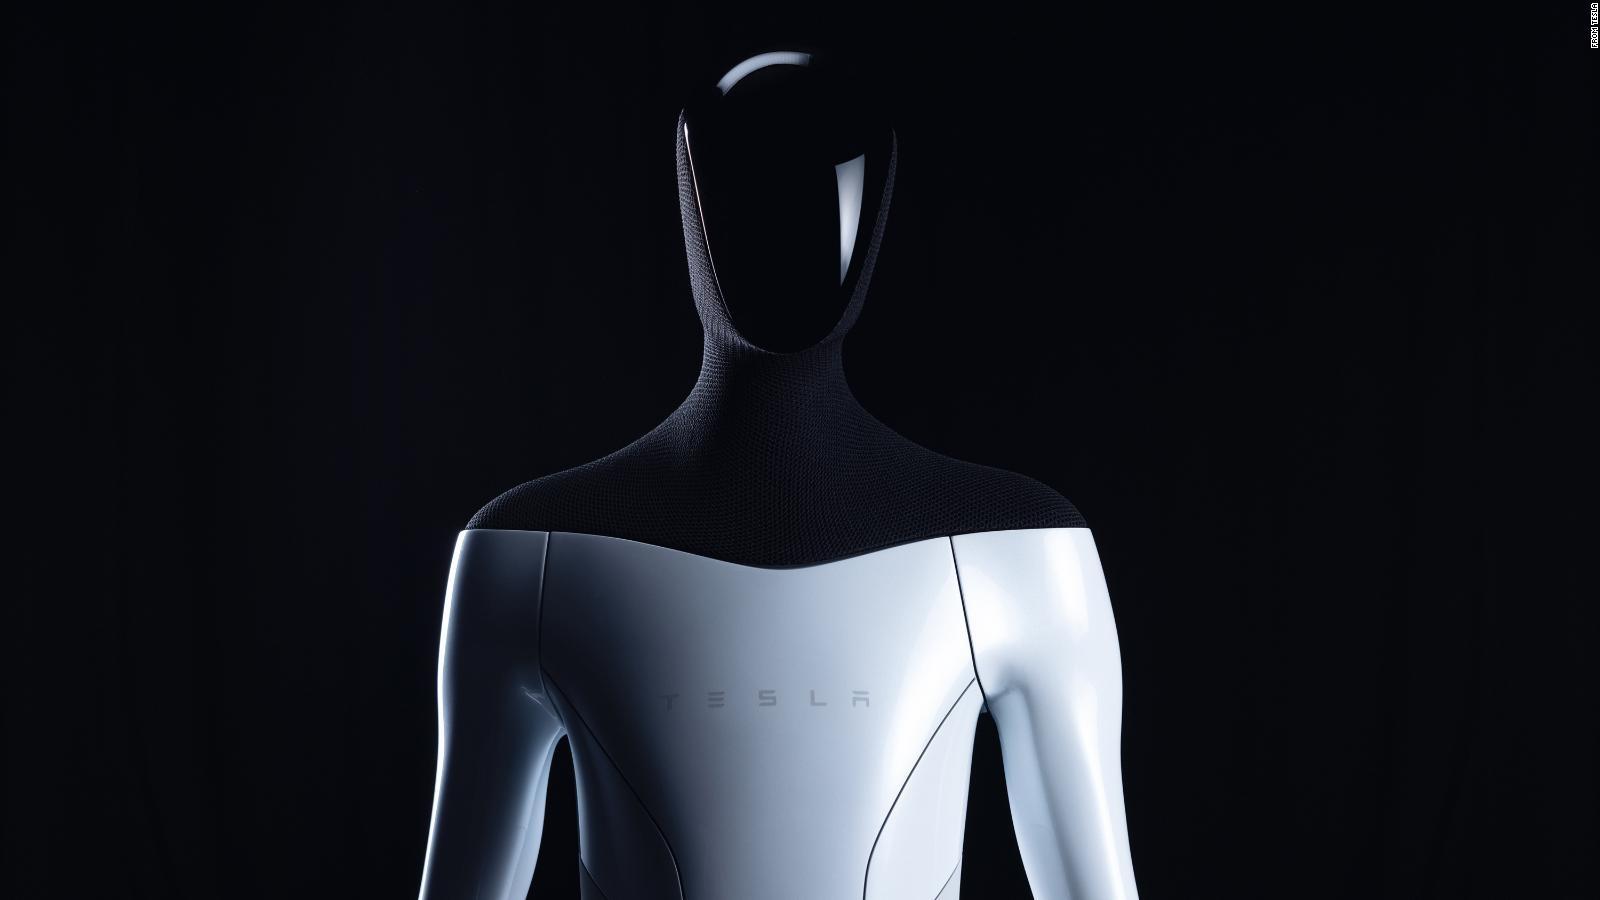 1630296999 Elon Musk Announces Tesla Building Humanoid Robot